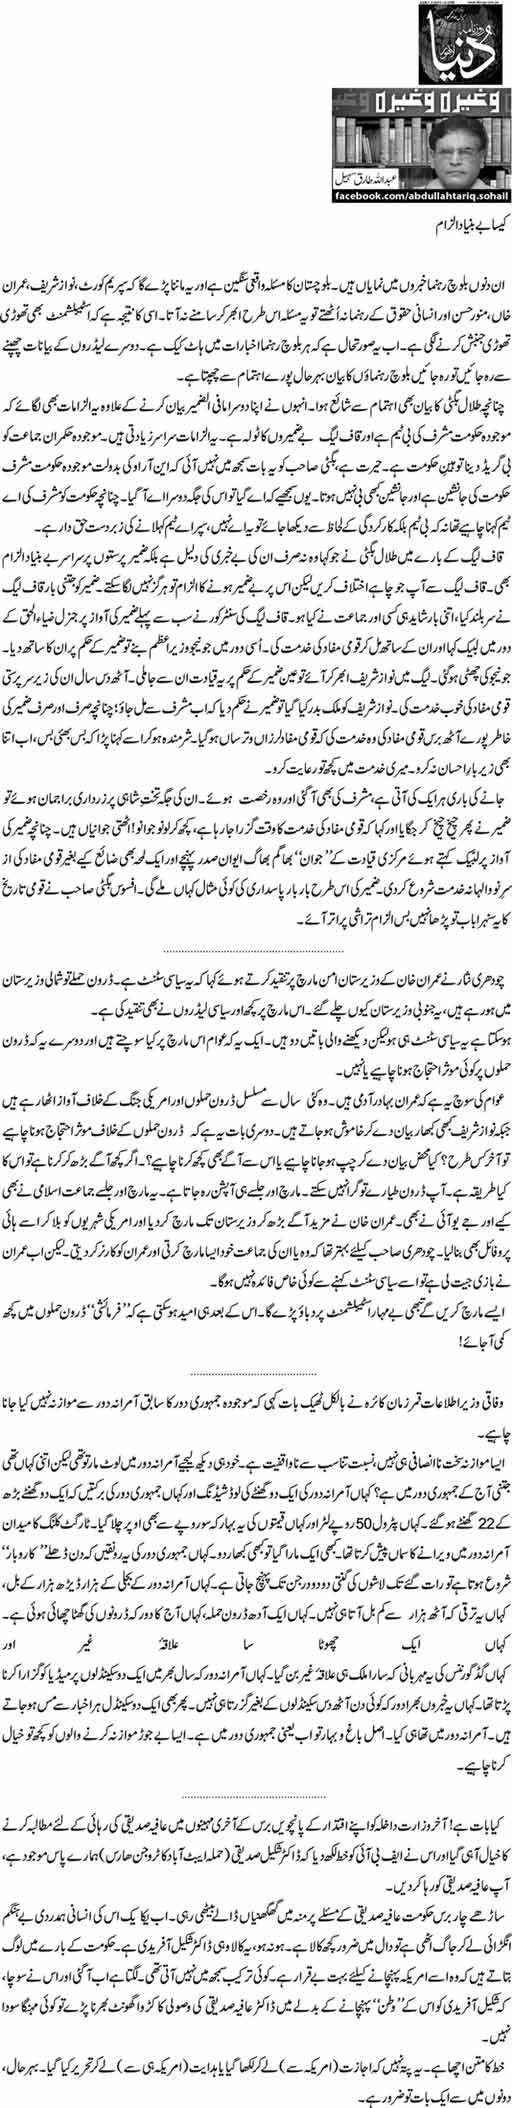 kaisa be bunyad ilzaam - Abdullah Tariq Sohail